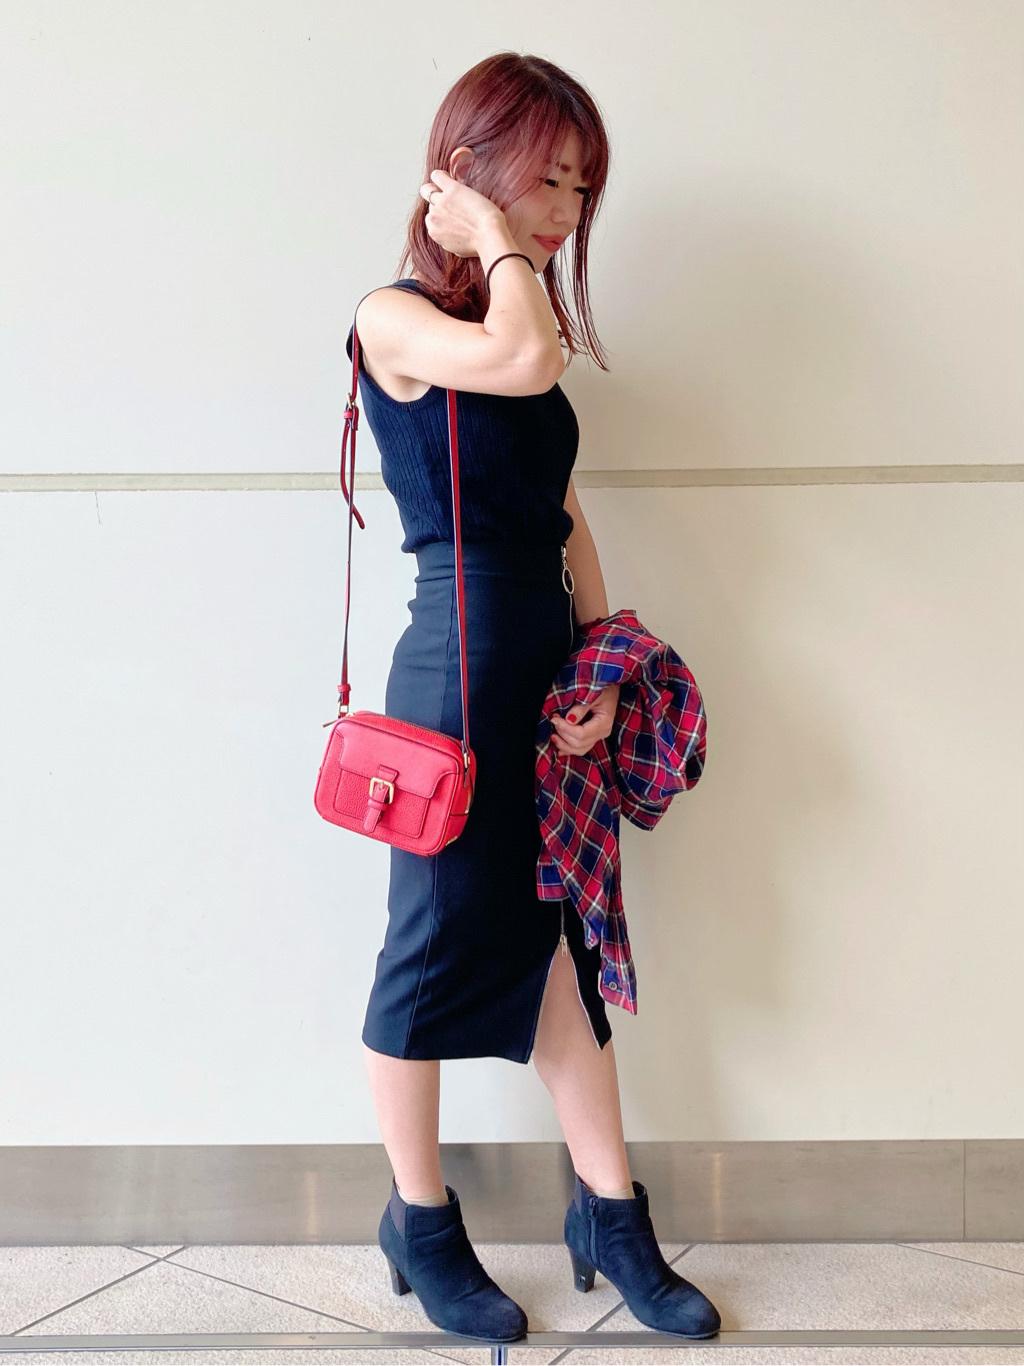 yosshiiii